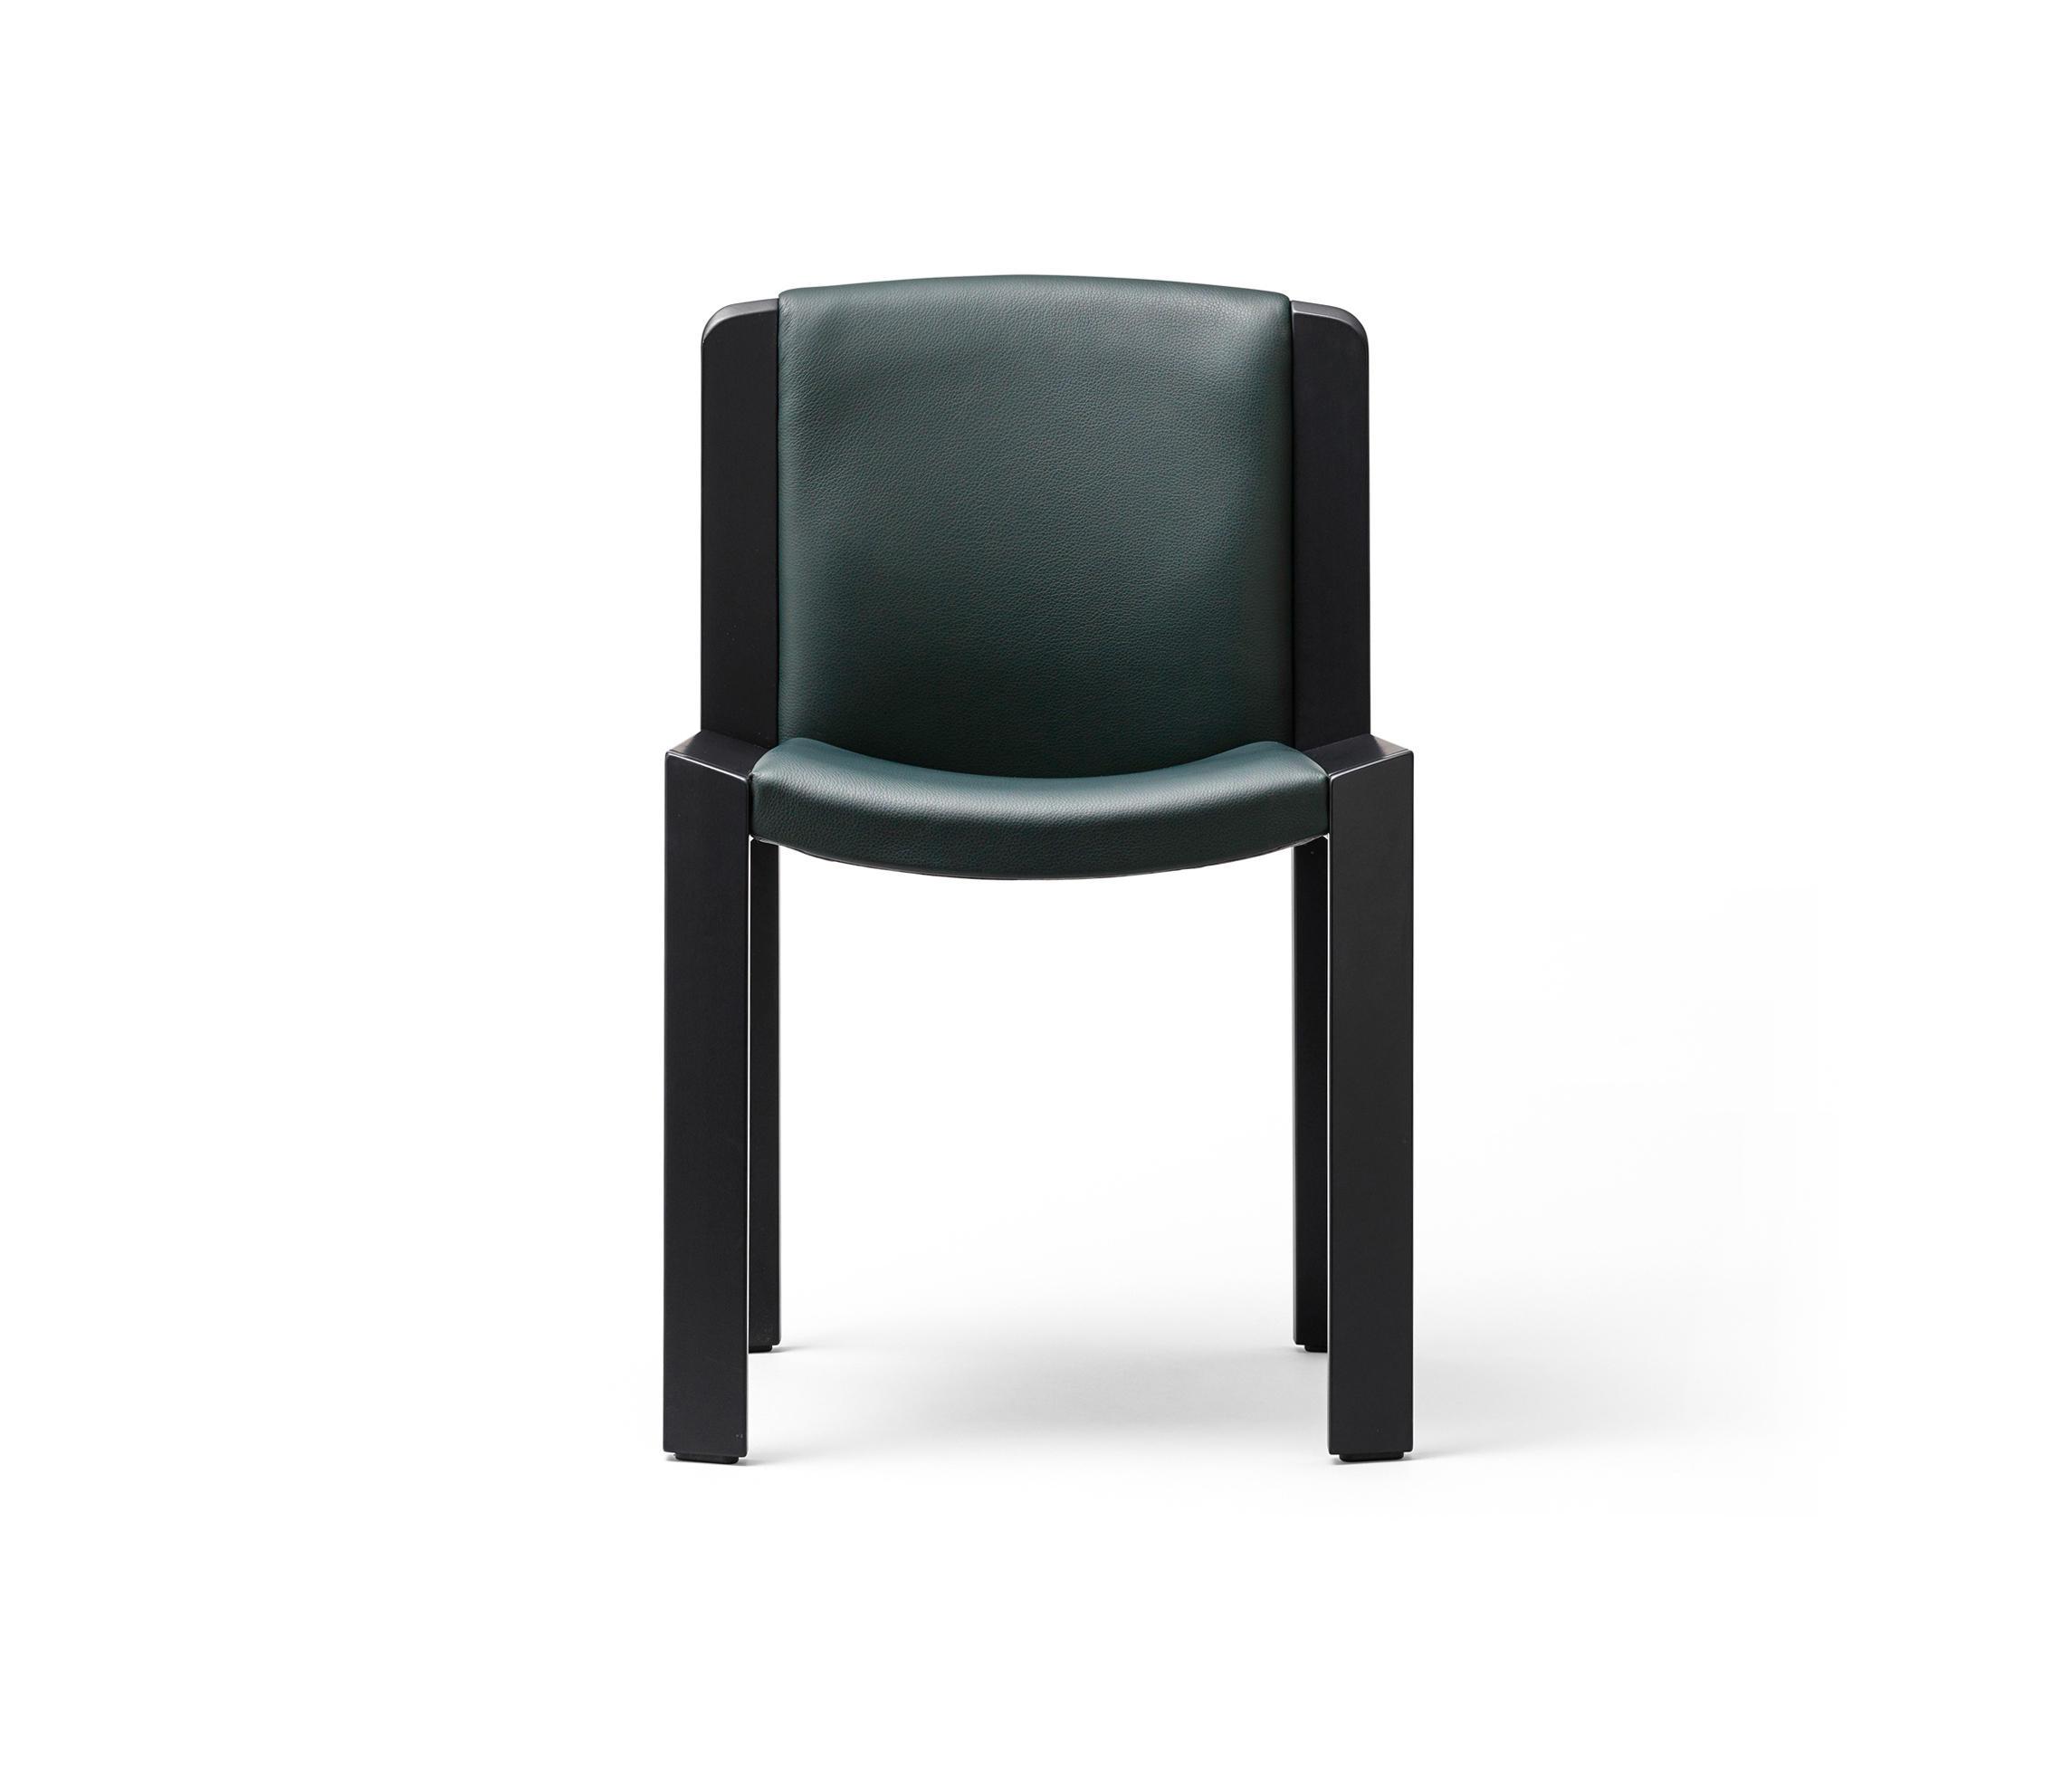 300 Black / Copenhagen Green Leather By Karakter Copenhagen | Visitors  Chairs / Side Chairs ...